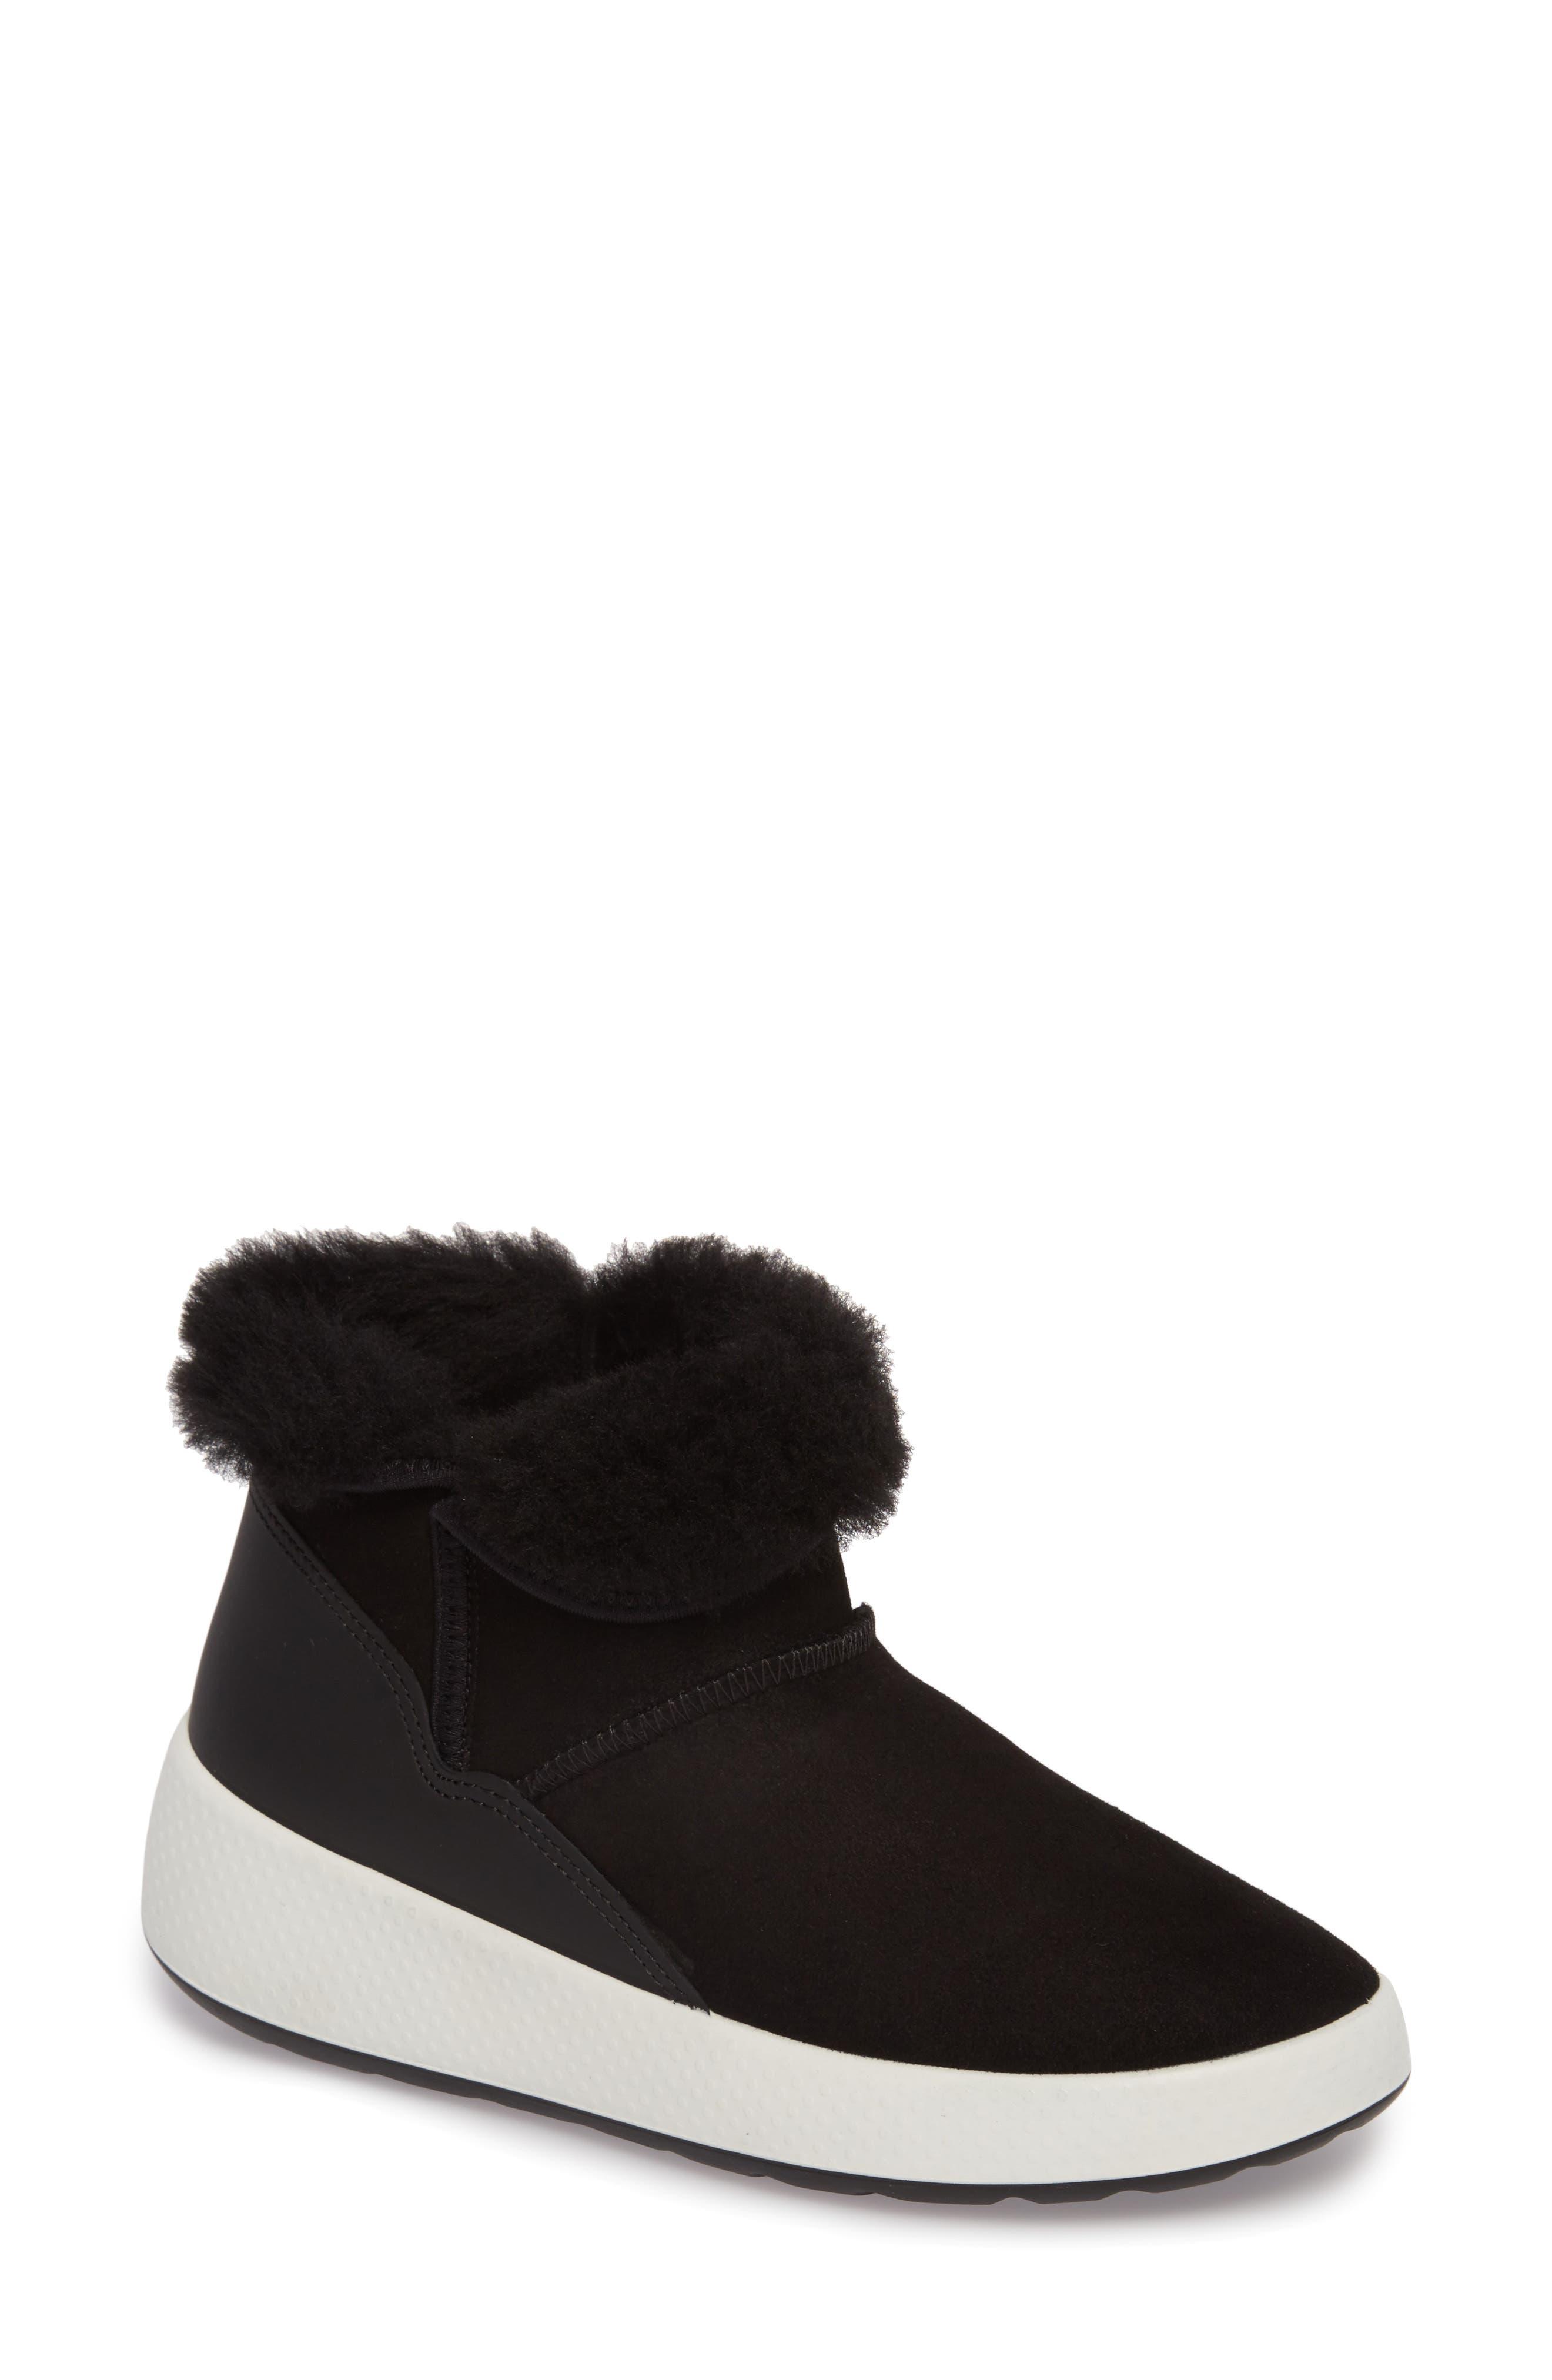 Ukiuk Genuine Shearling Boot,                         Main,                         color, Black Leather